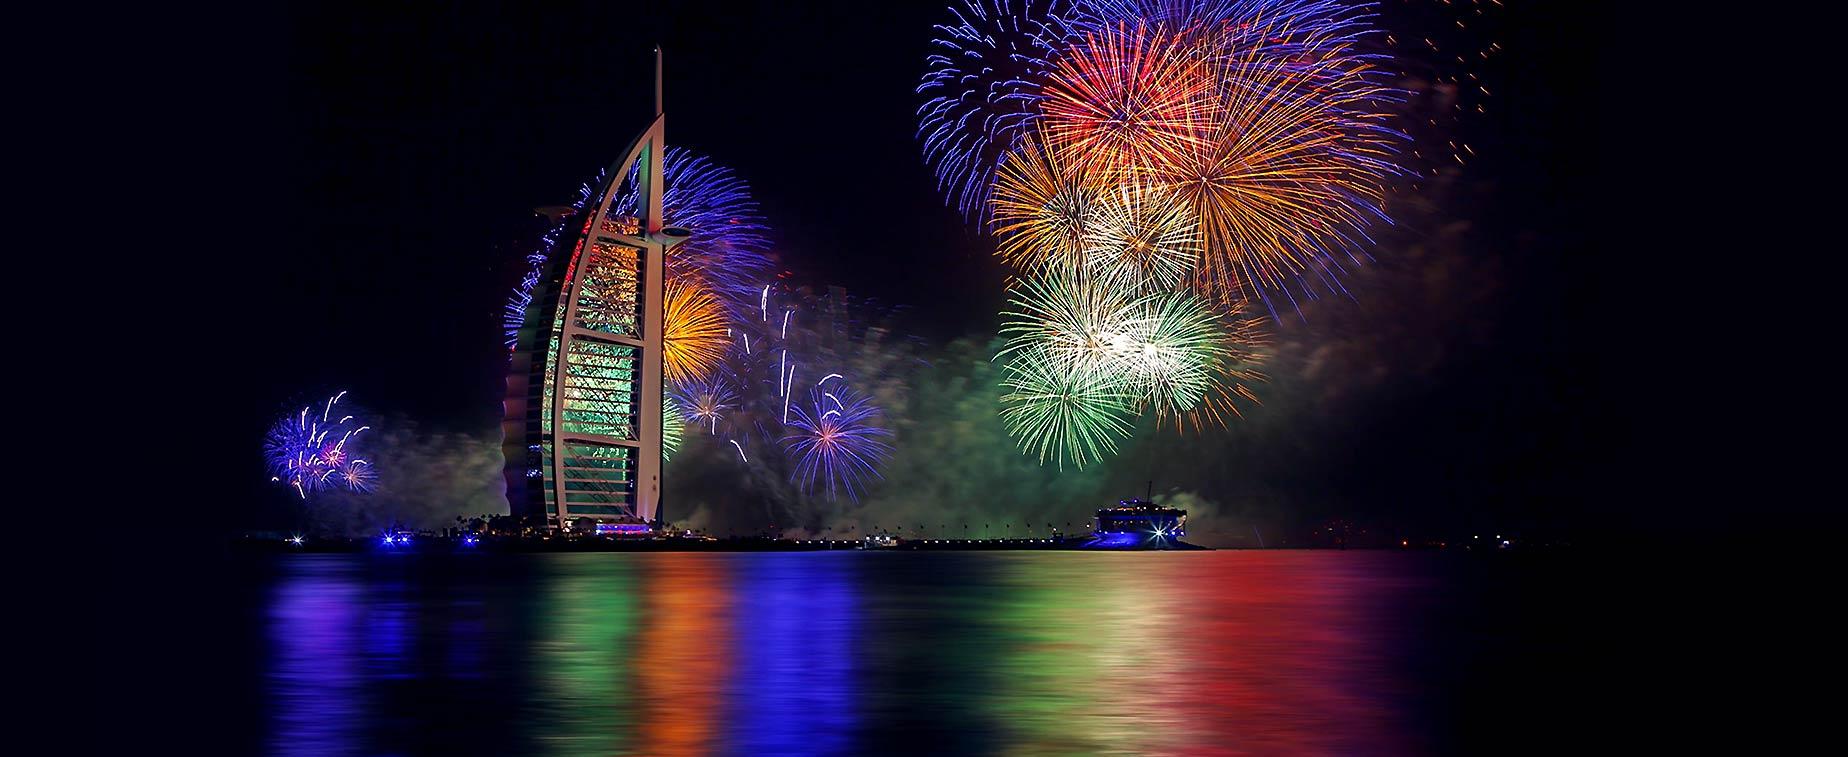 Dubai Leads New Year's Eve